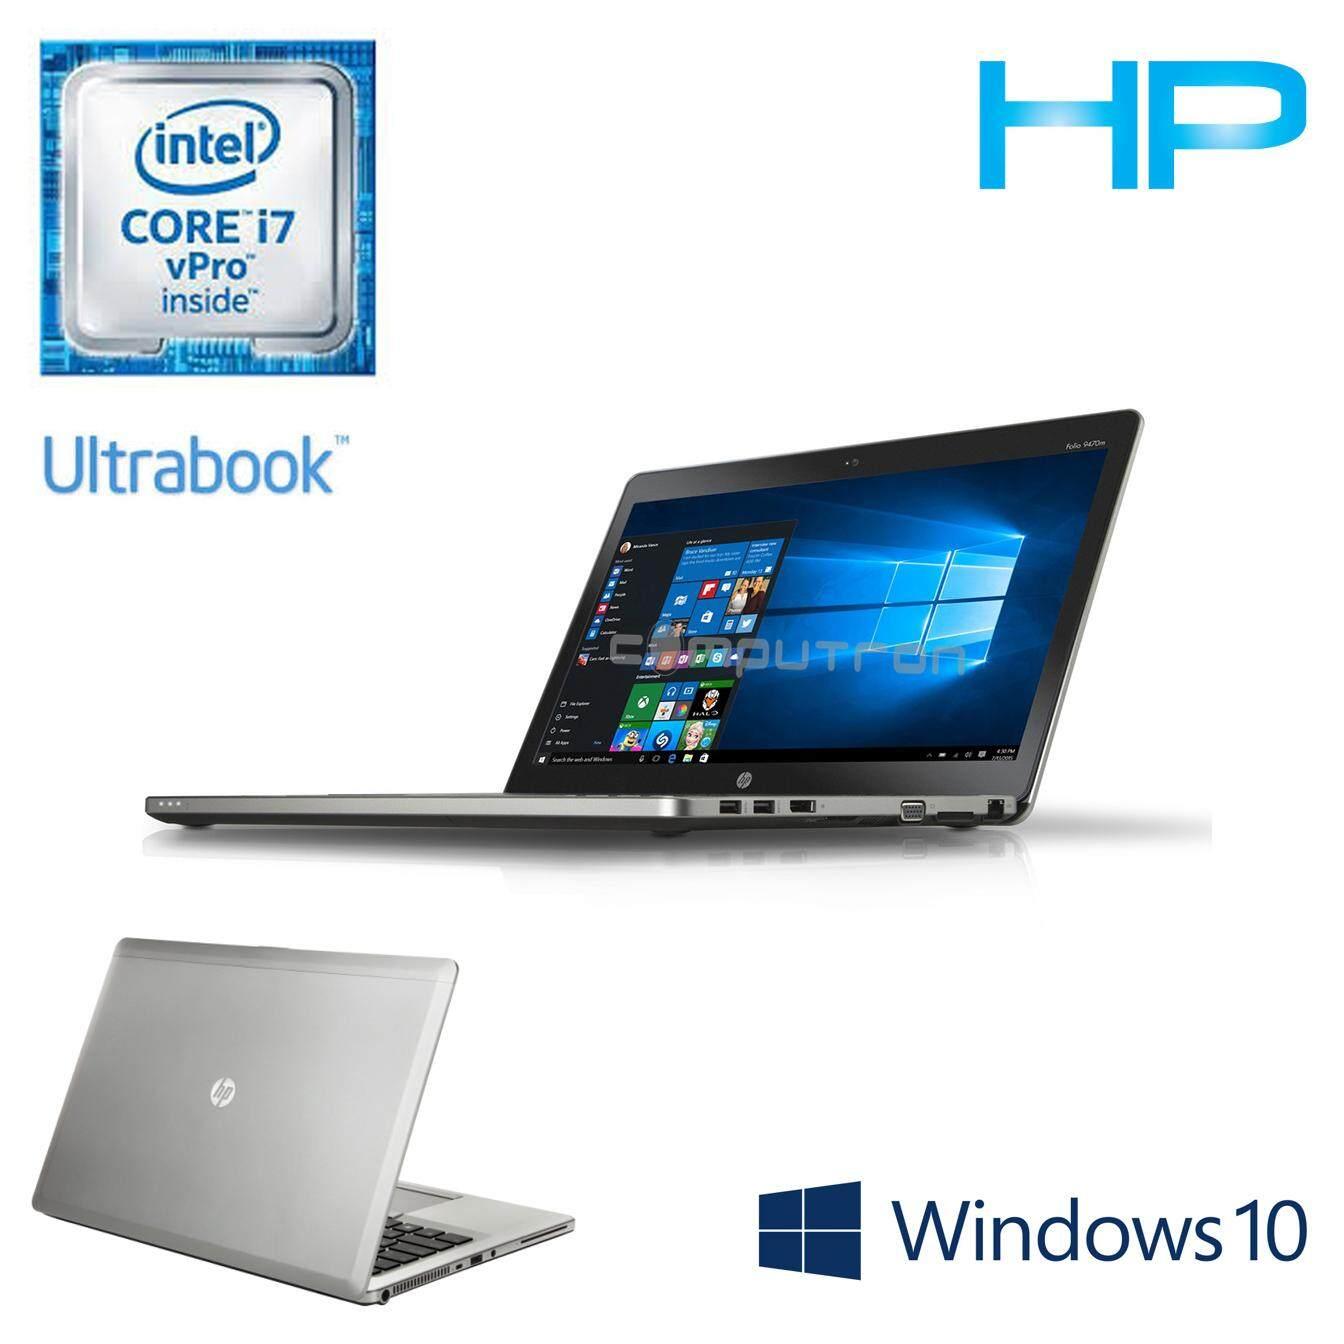 HP ELITEBOOK FOLIO 9480M [CORE I7-4600U/8GBRAM/500GBHD/W10PRO] 1 YEAR WARRANTY Malaysia